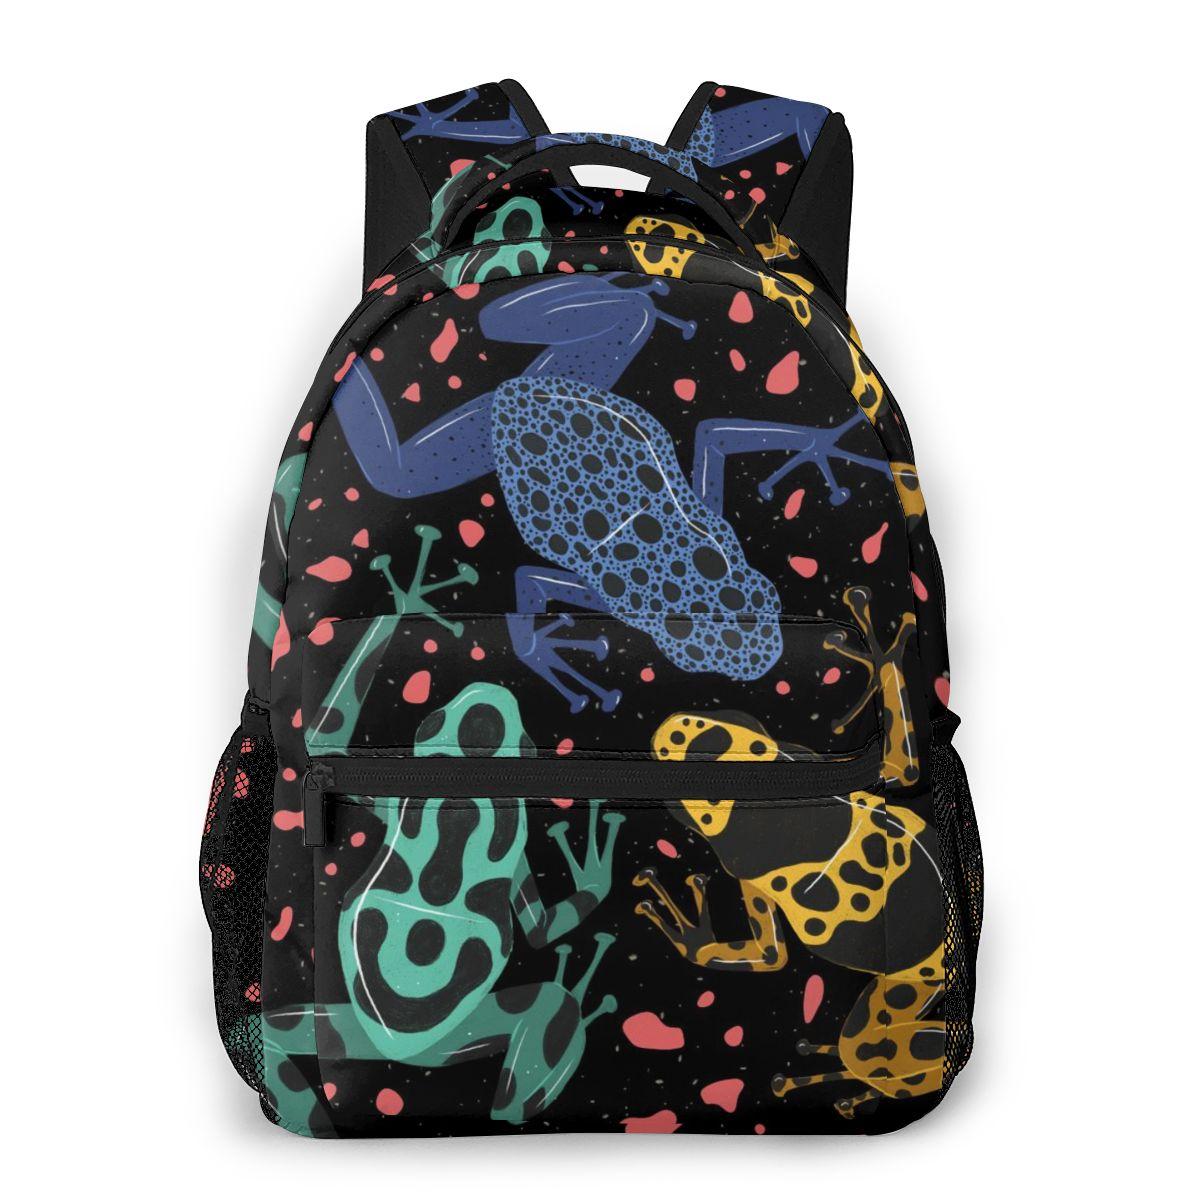 Mochila de ranas Poison Dart, mochilas escolares informales para adolescentes, bolso de hombro para chicas, bolsas de viaje